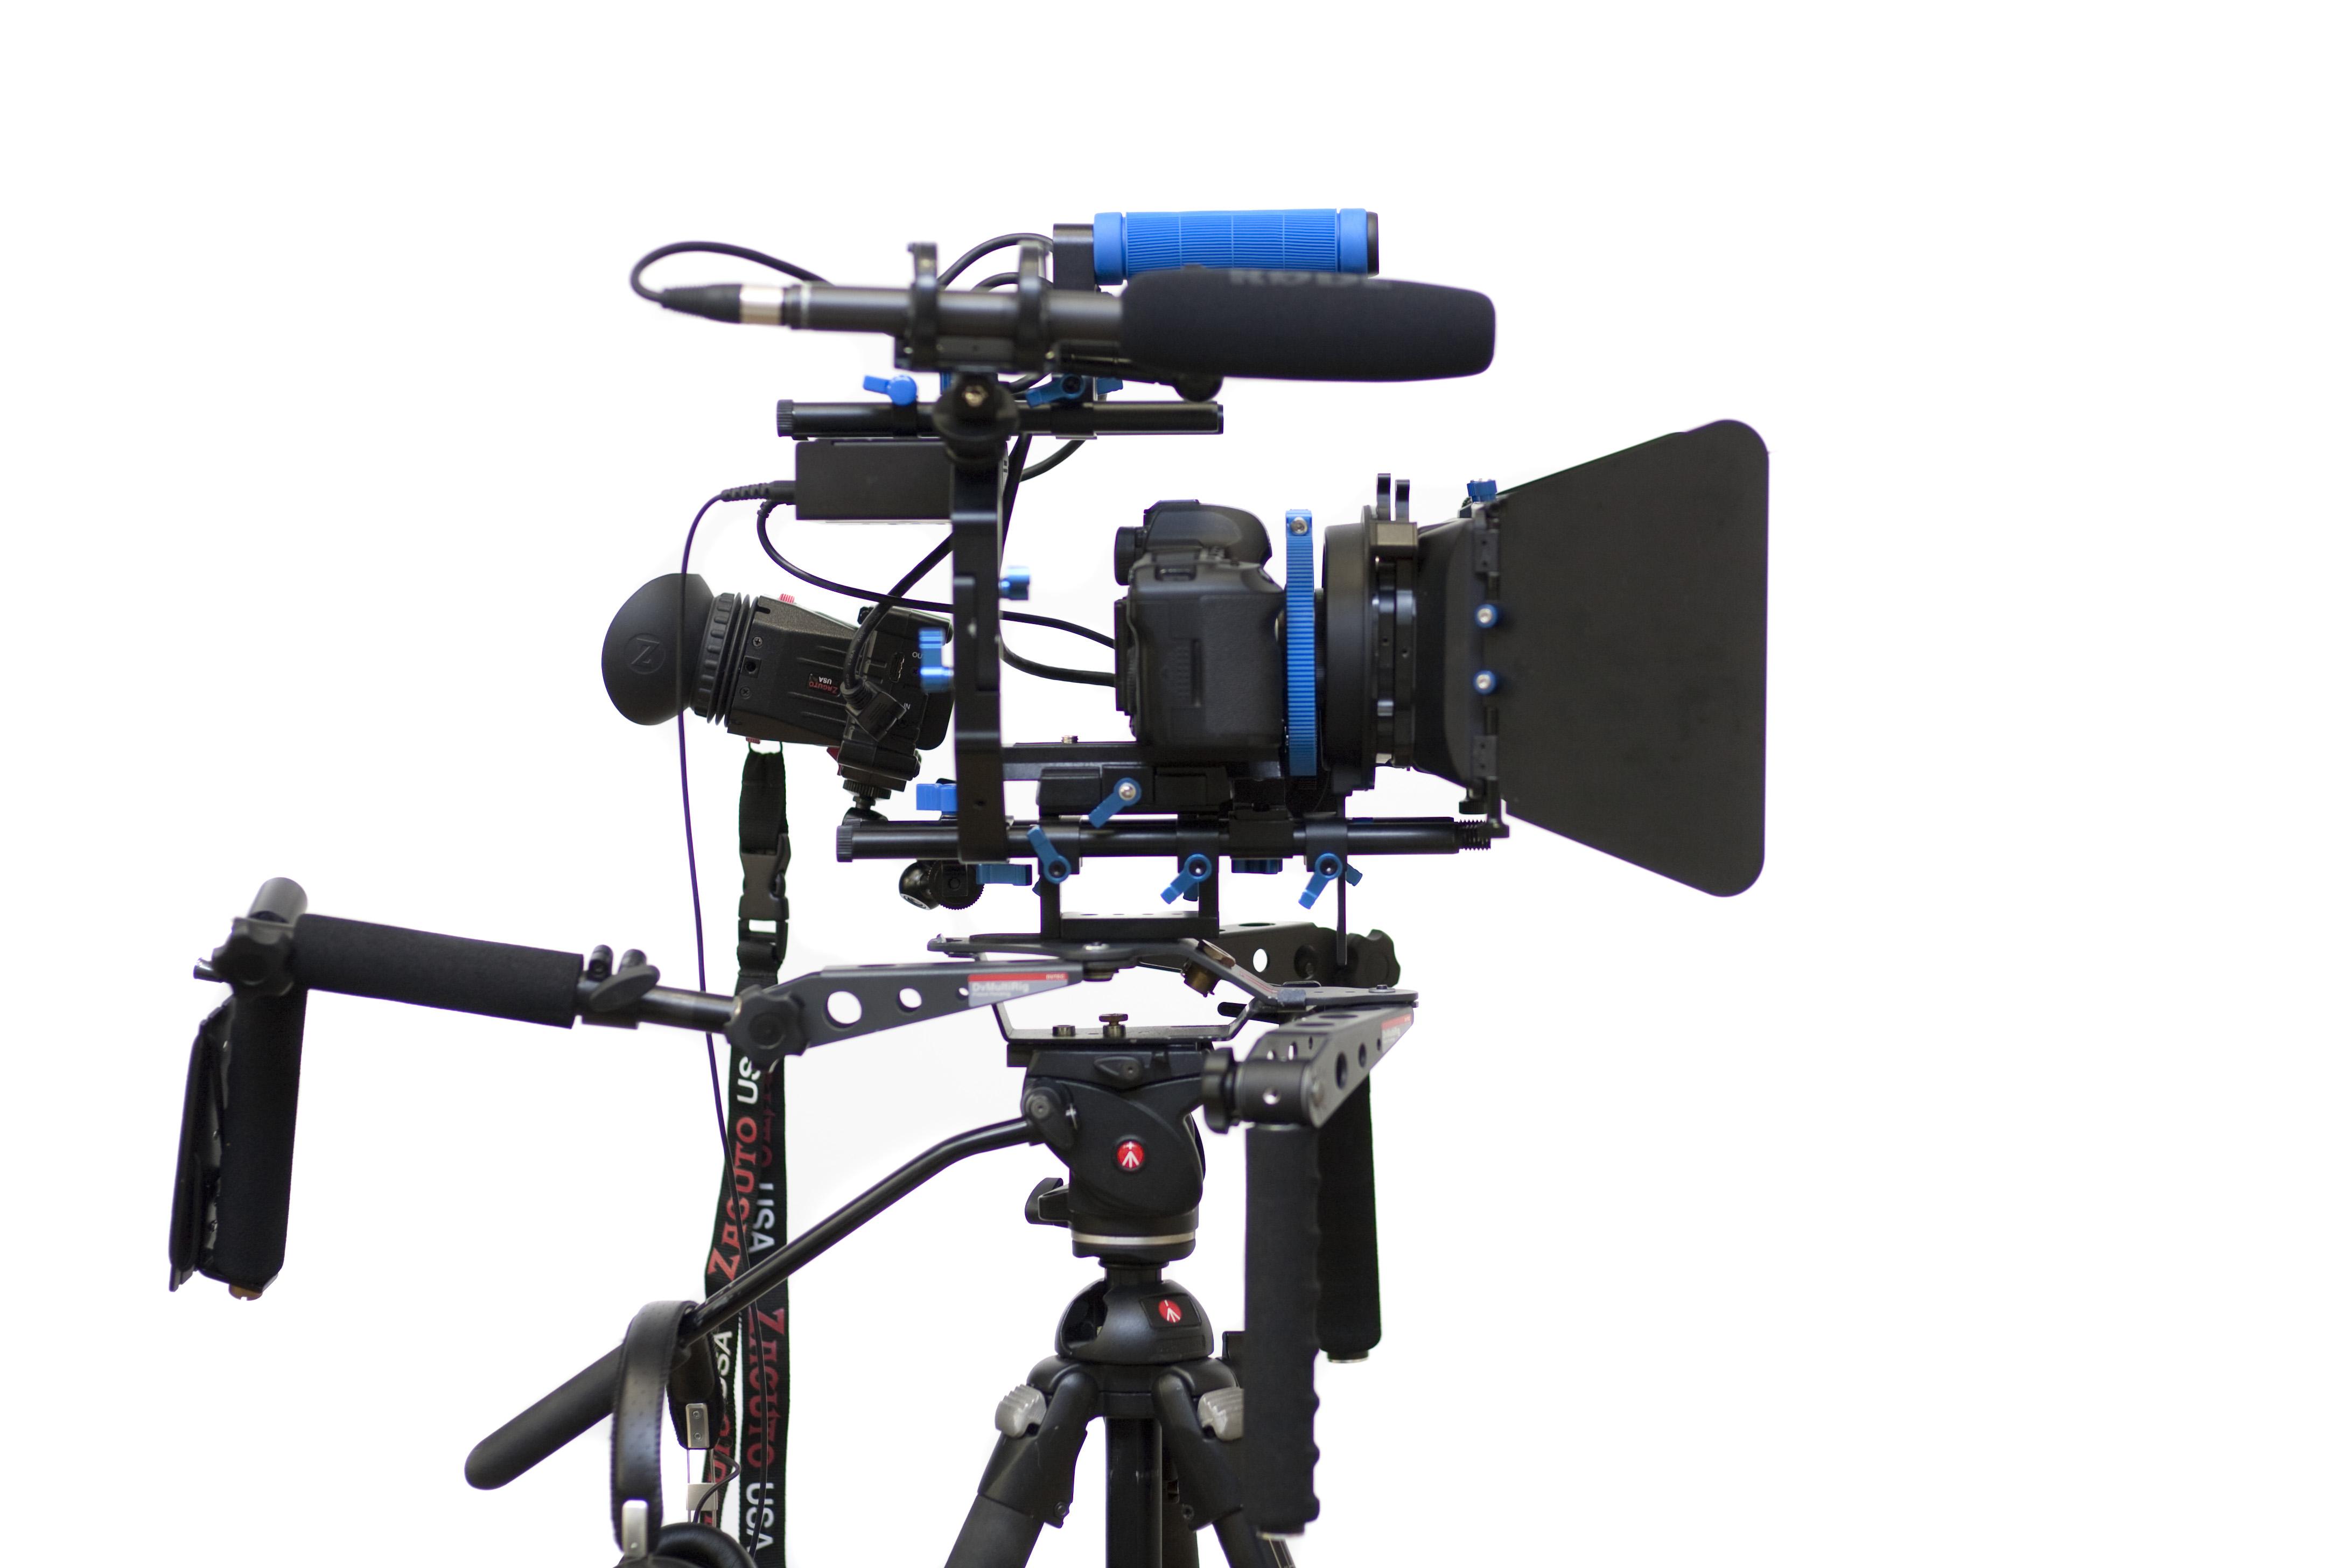 File:DSLR Video rig.jpg - Wikimedia Commons